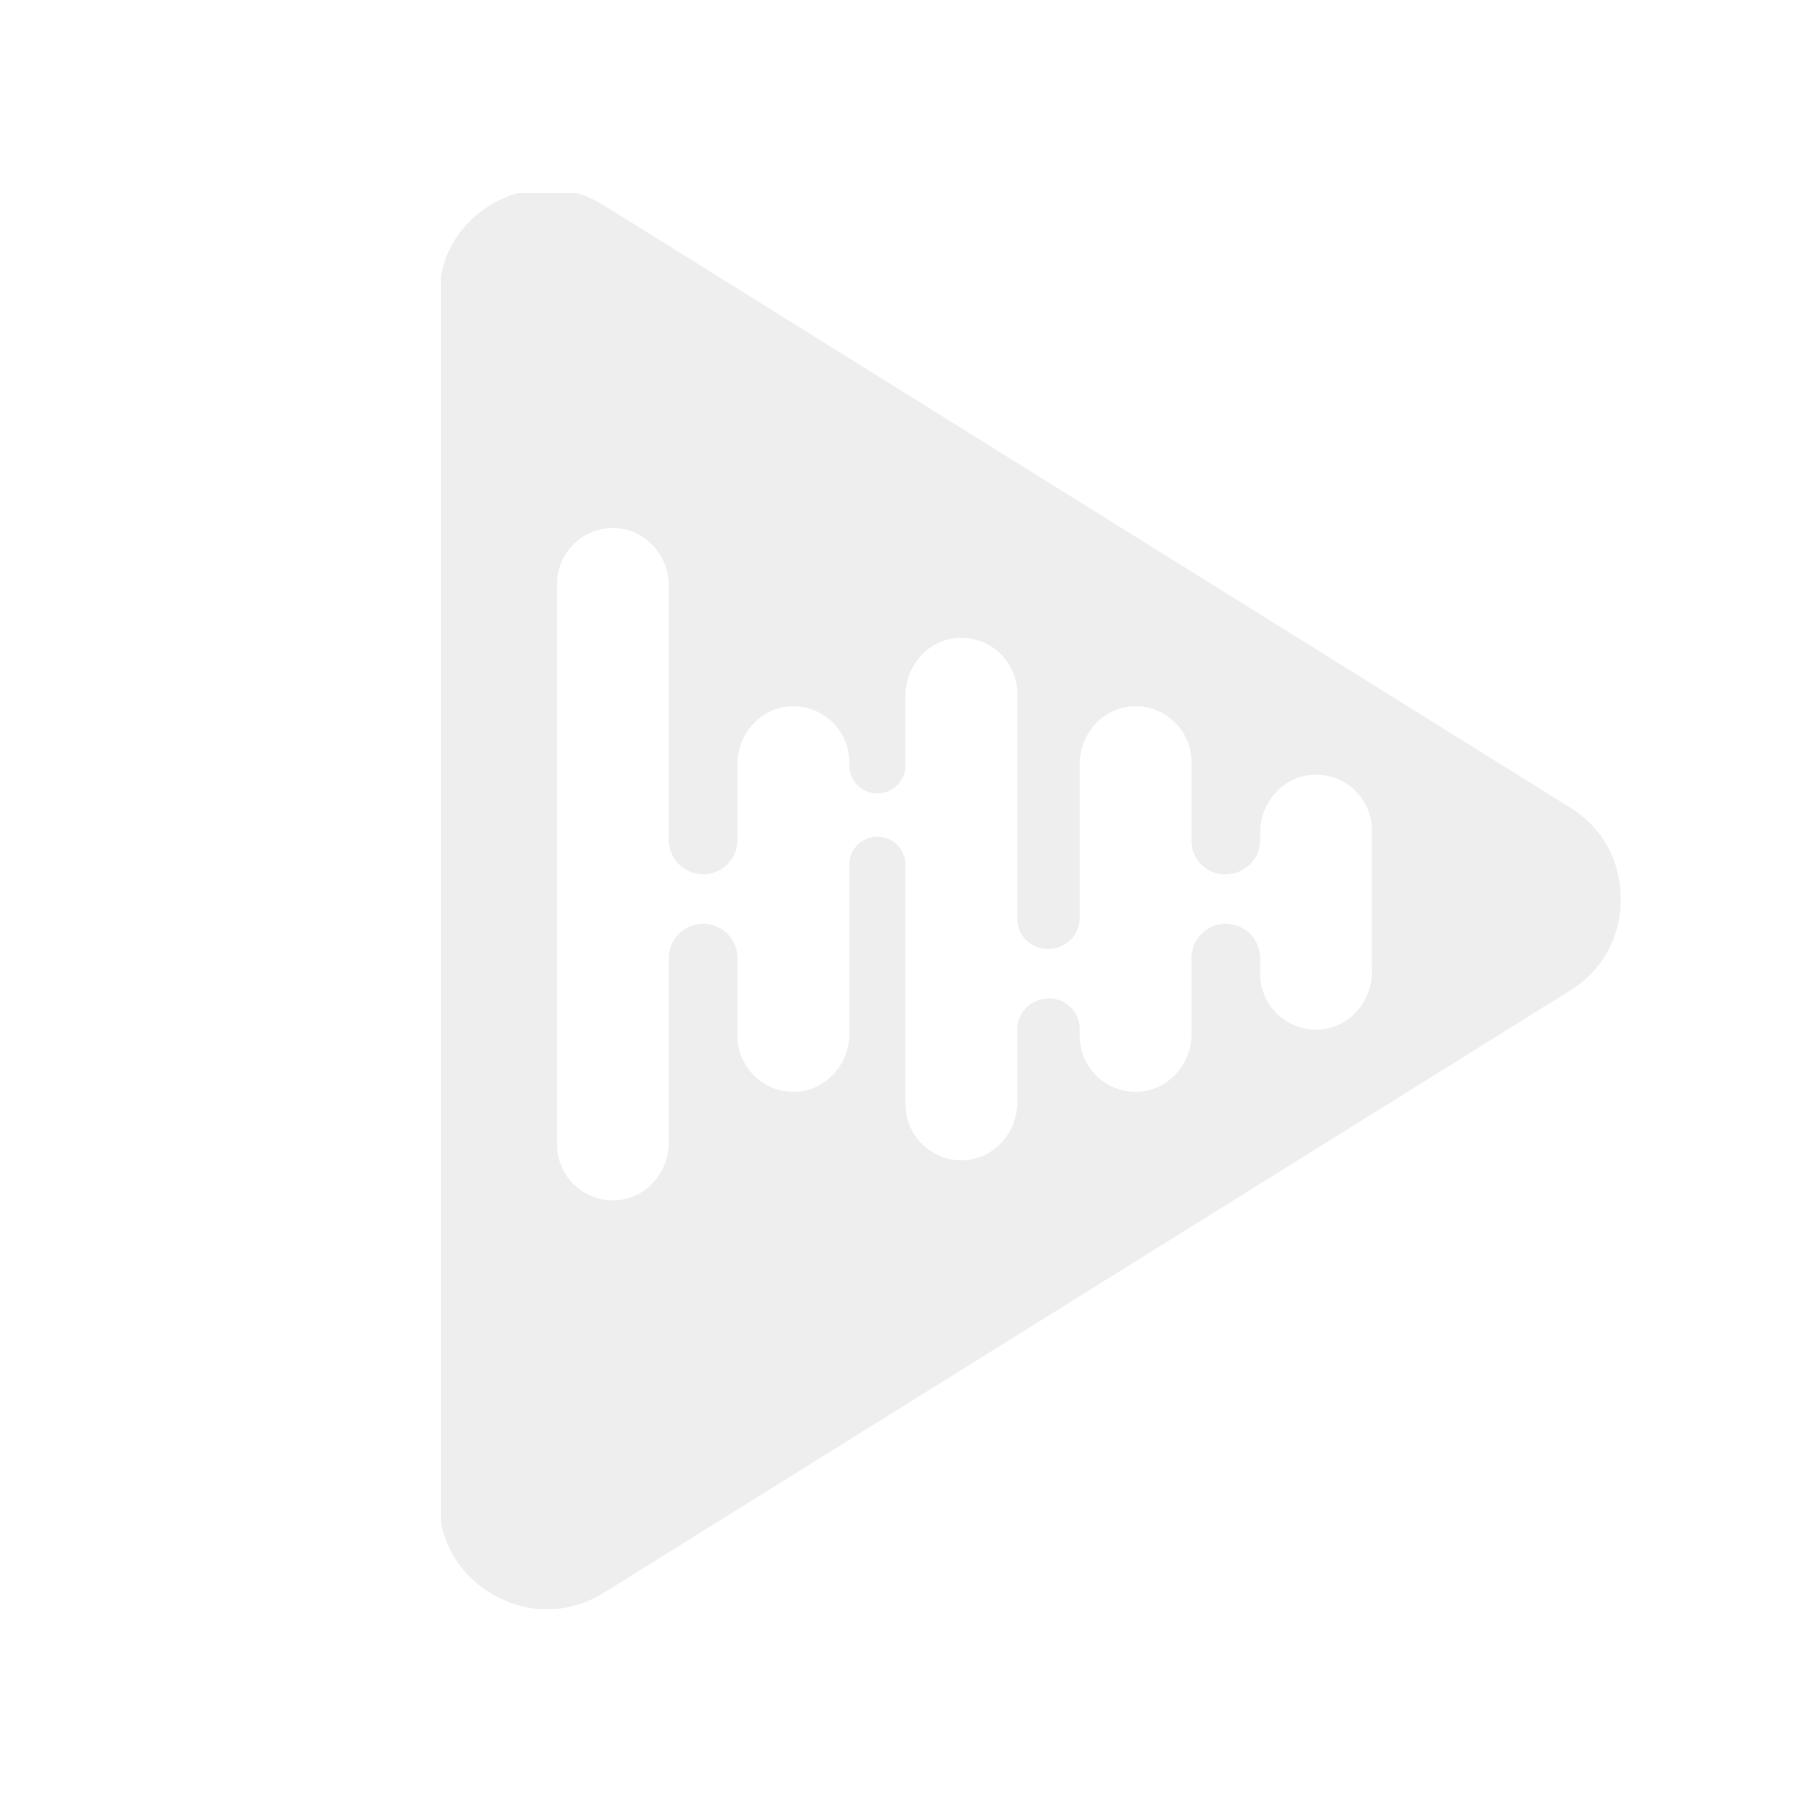 Audison APBMW-E81-HIFI